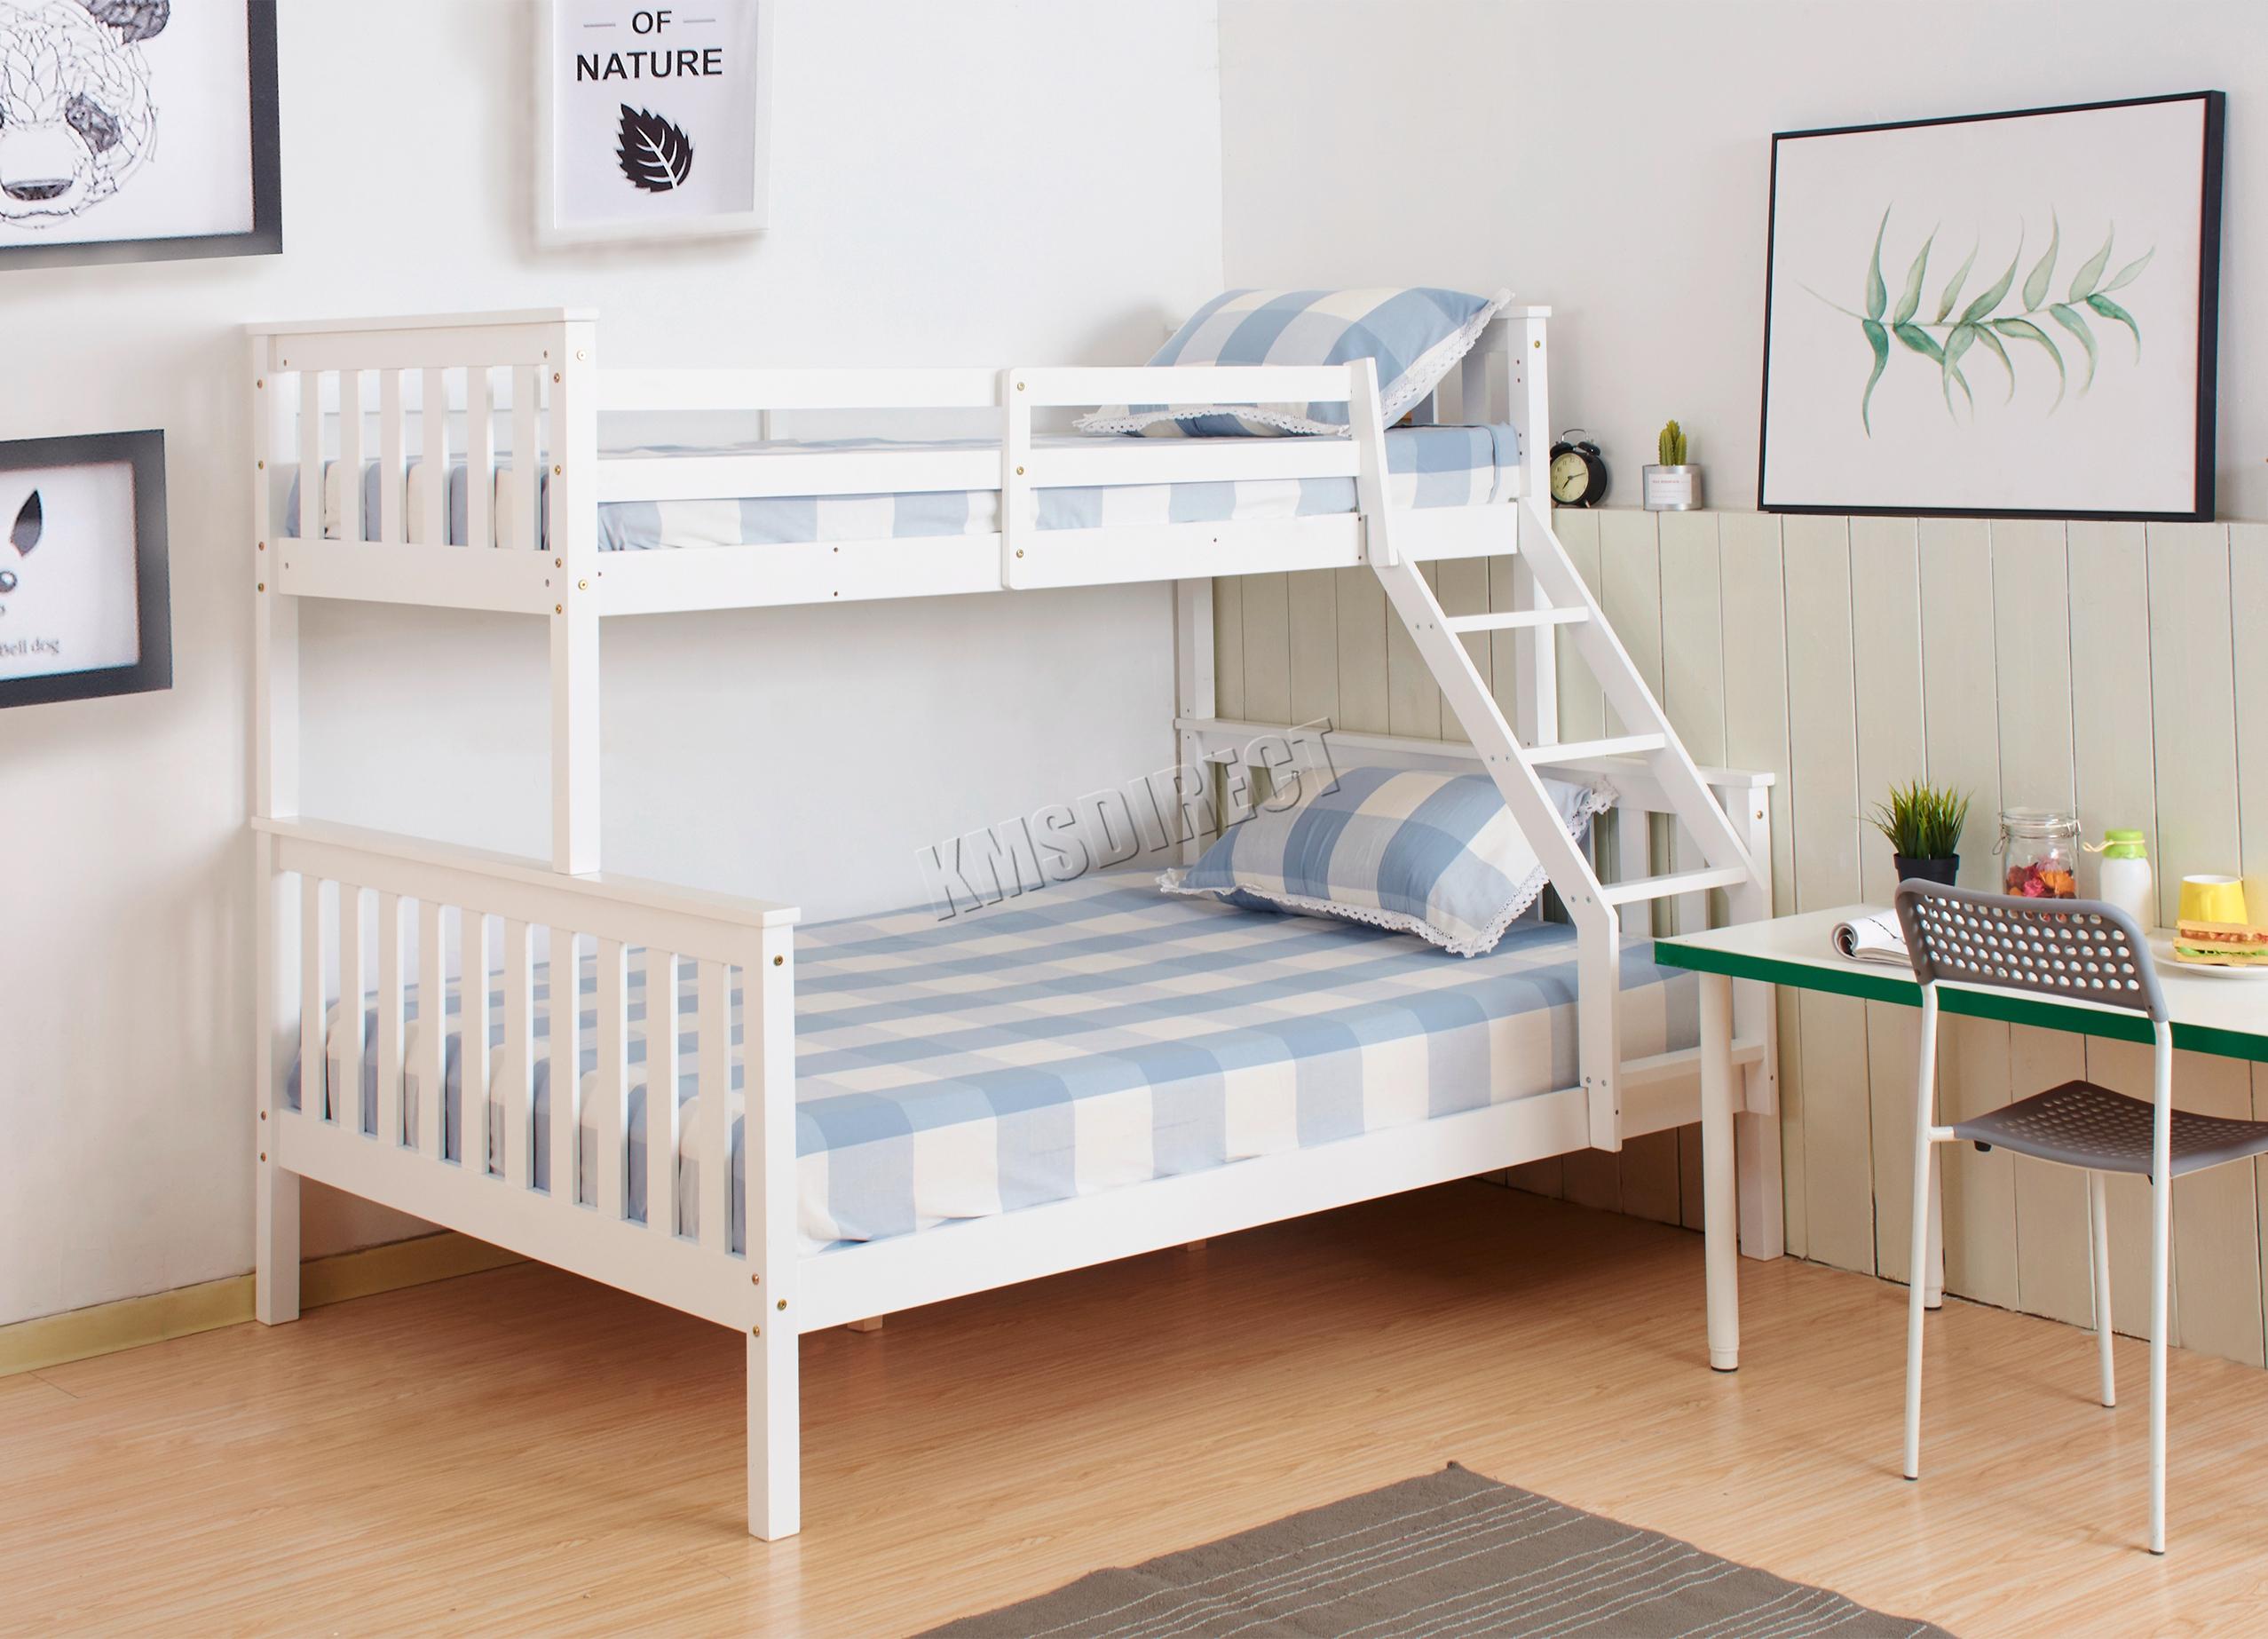 Westwood Bunk Bed Wooden Frame Children Kids Triple